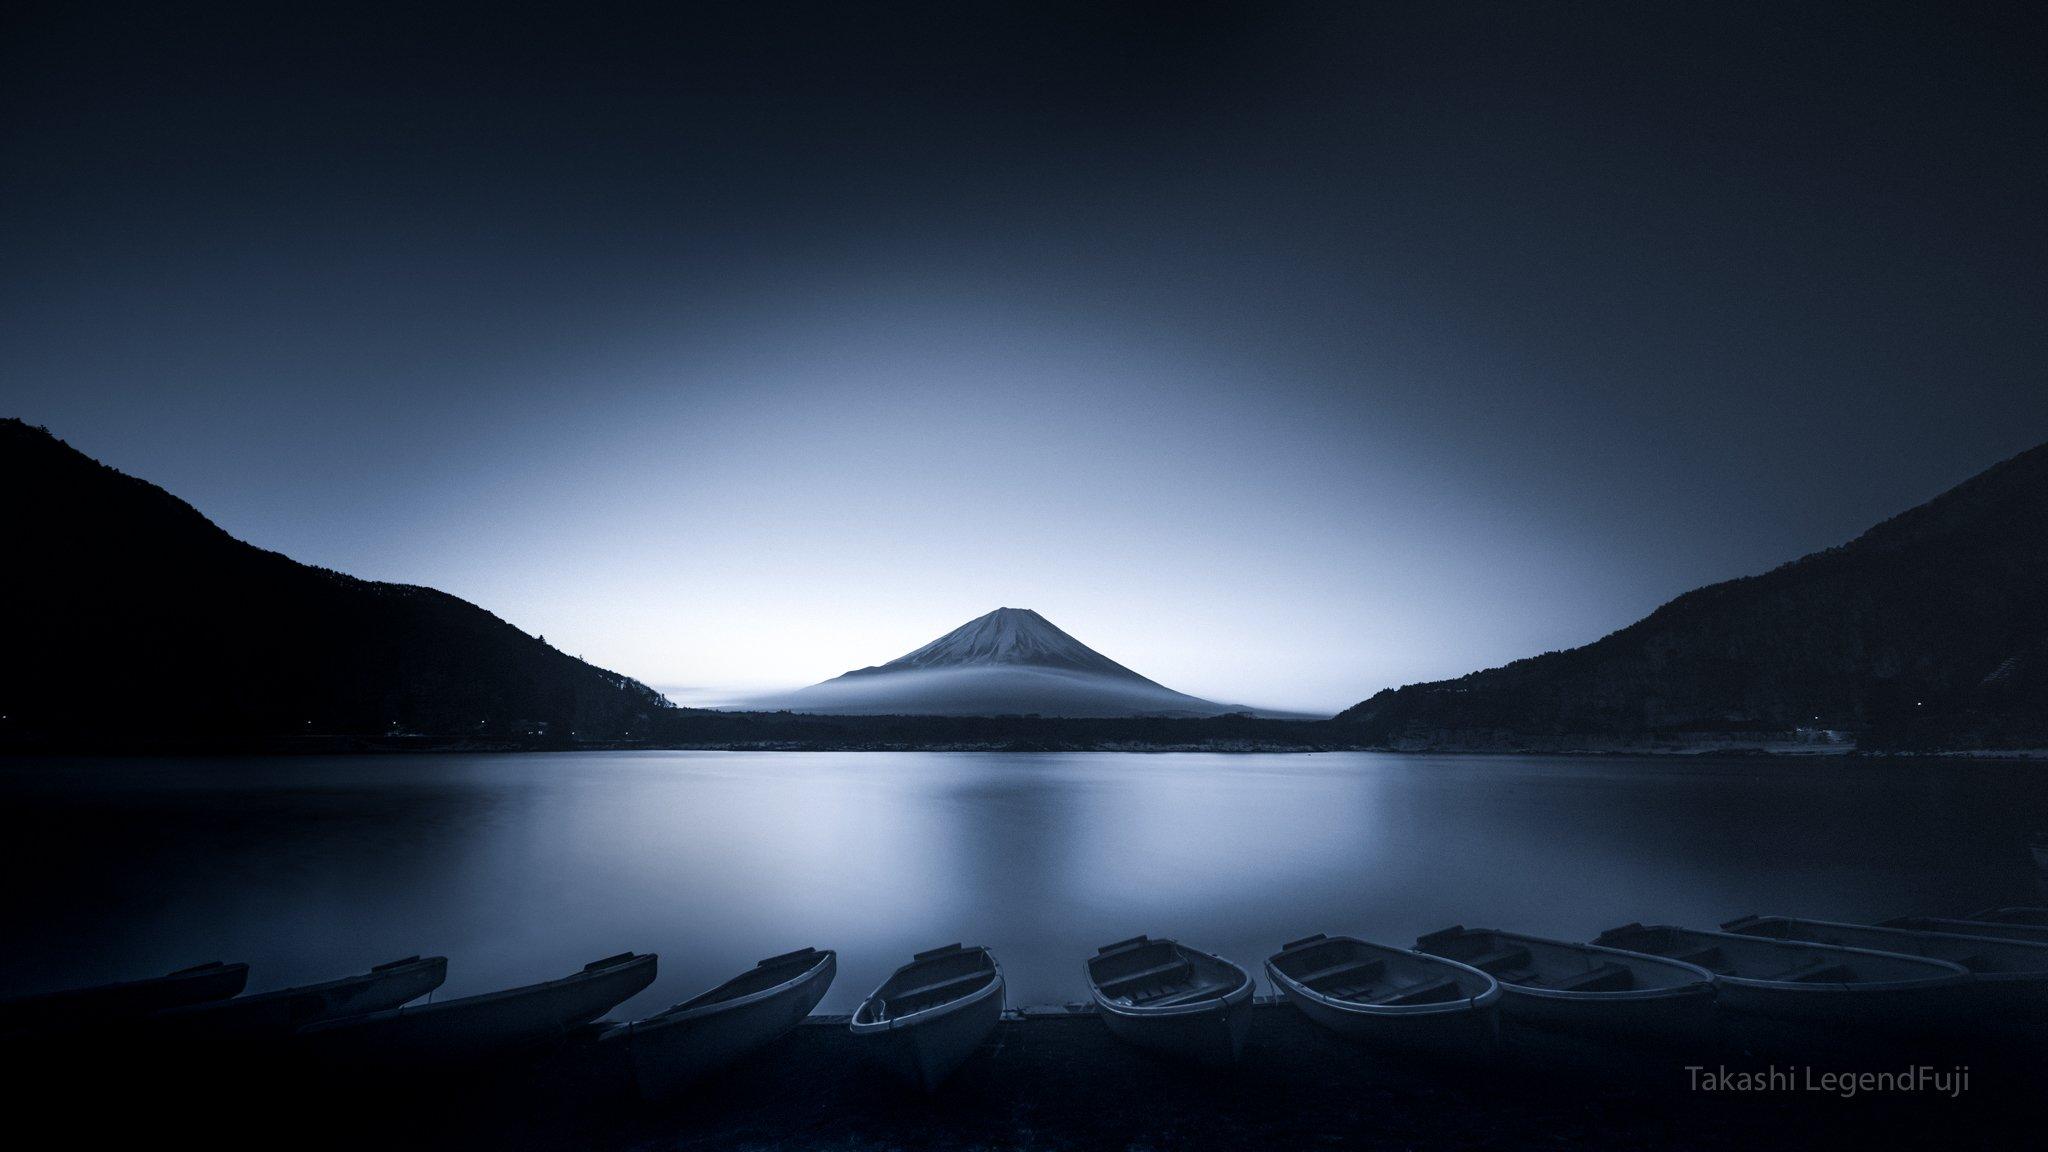 fuji,mountain,japan,lake,water,boat,sunshine,sunrise,morning,amazing,landscape,wonderful,beautiful,, Takashi